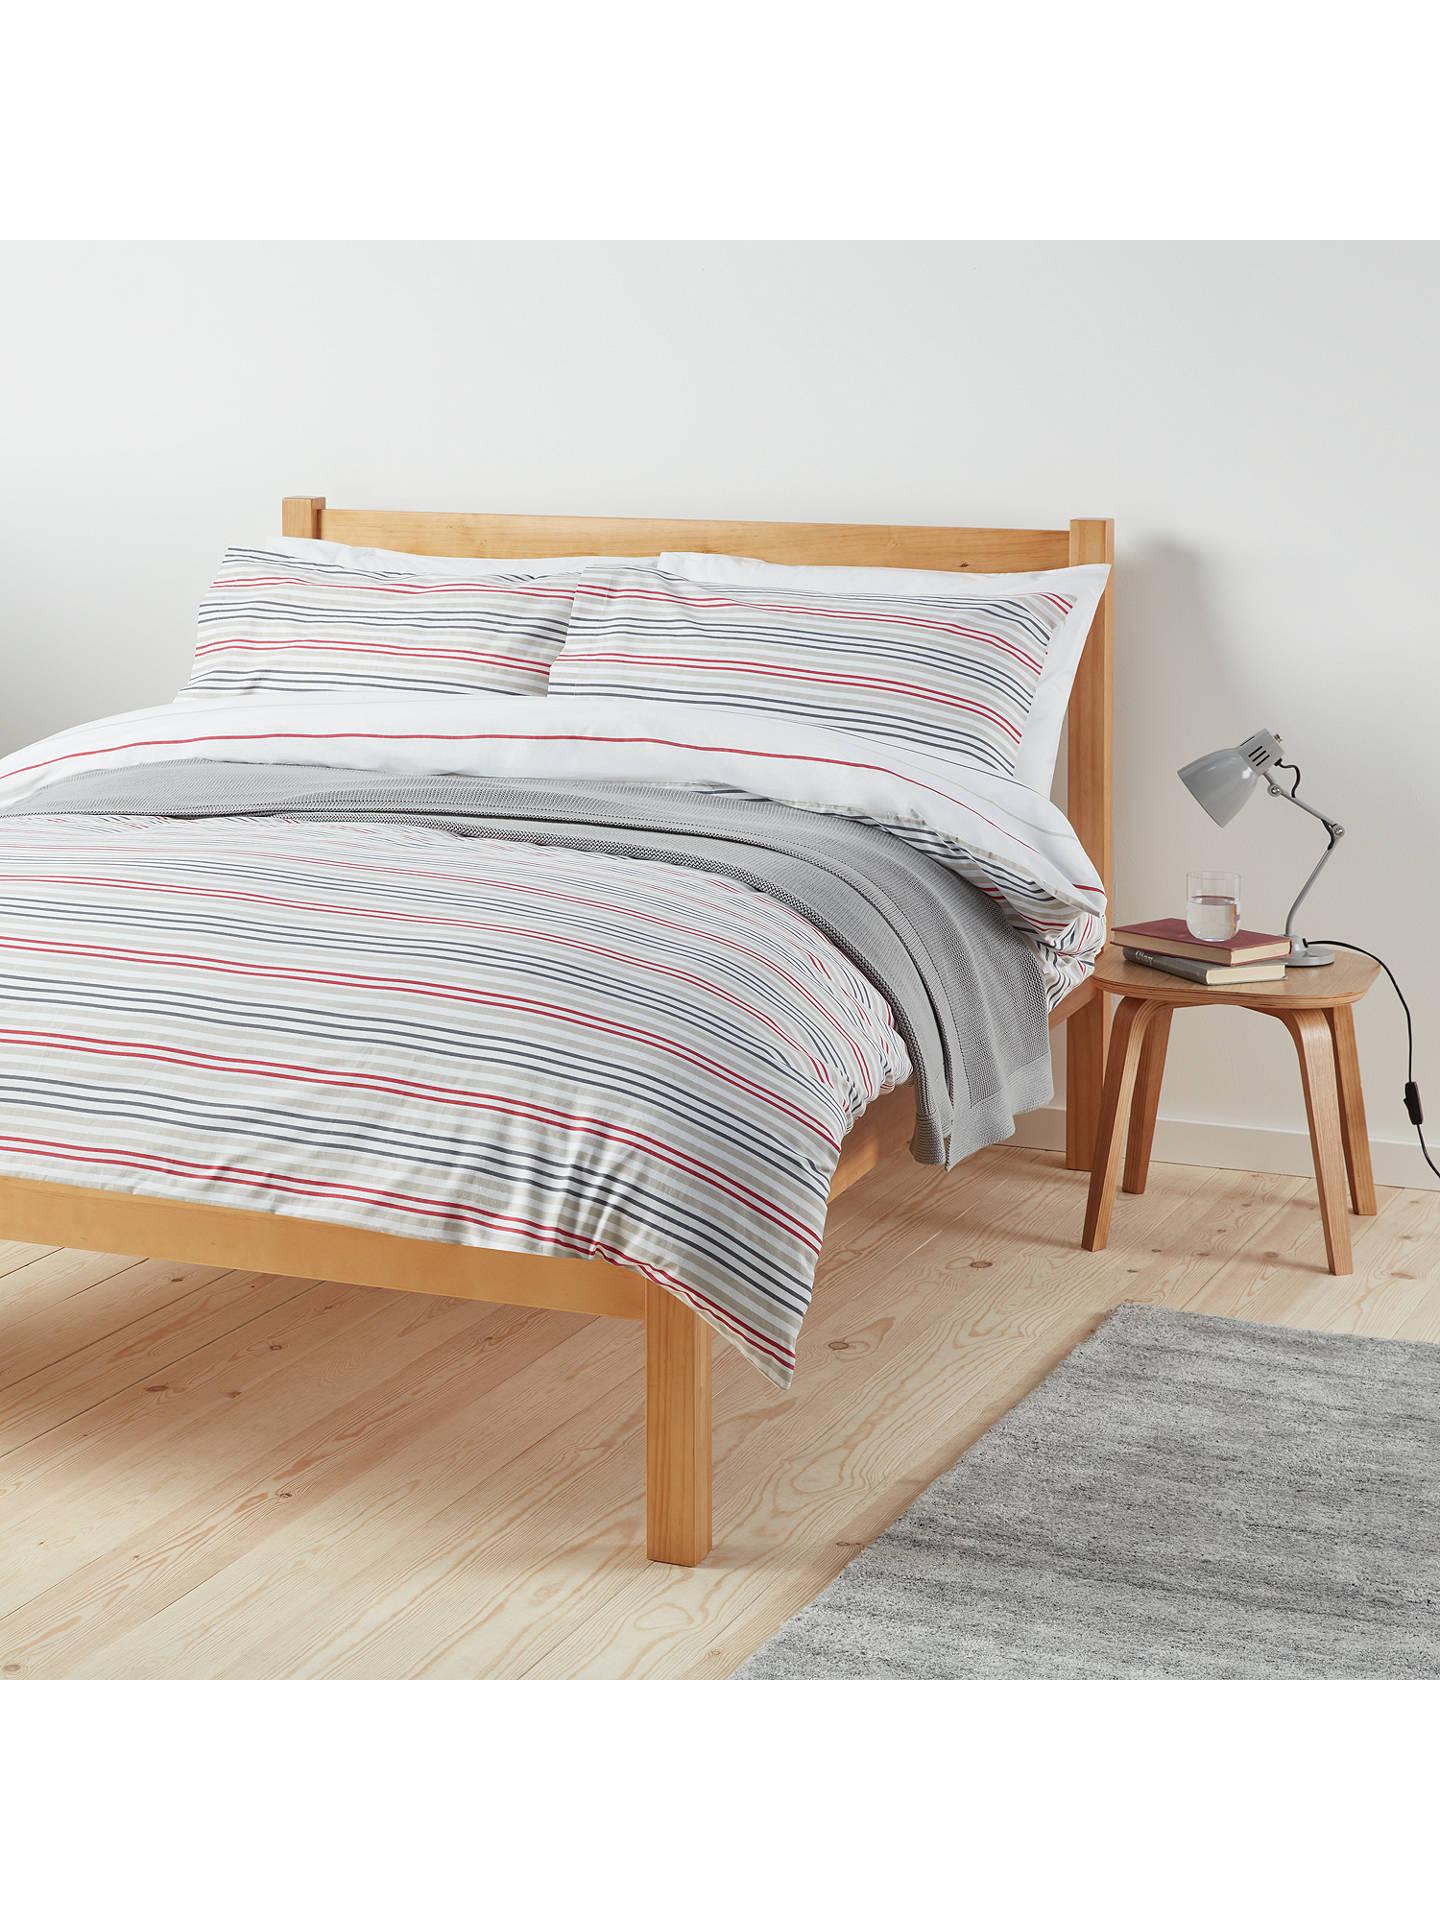 John lewis & Partners The Basics Polycotton Stripes Single Duvet & Pillow Case £5 (£2 c&c / £3.50 del)